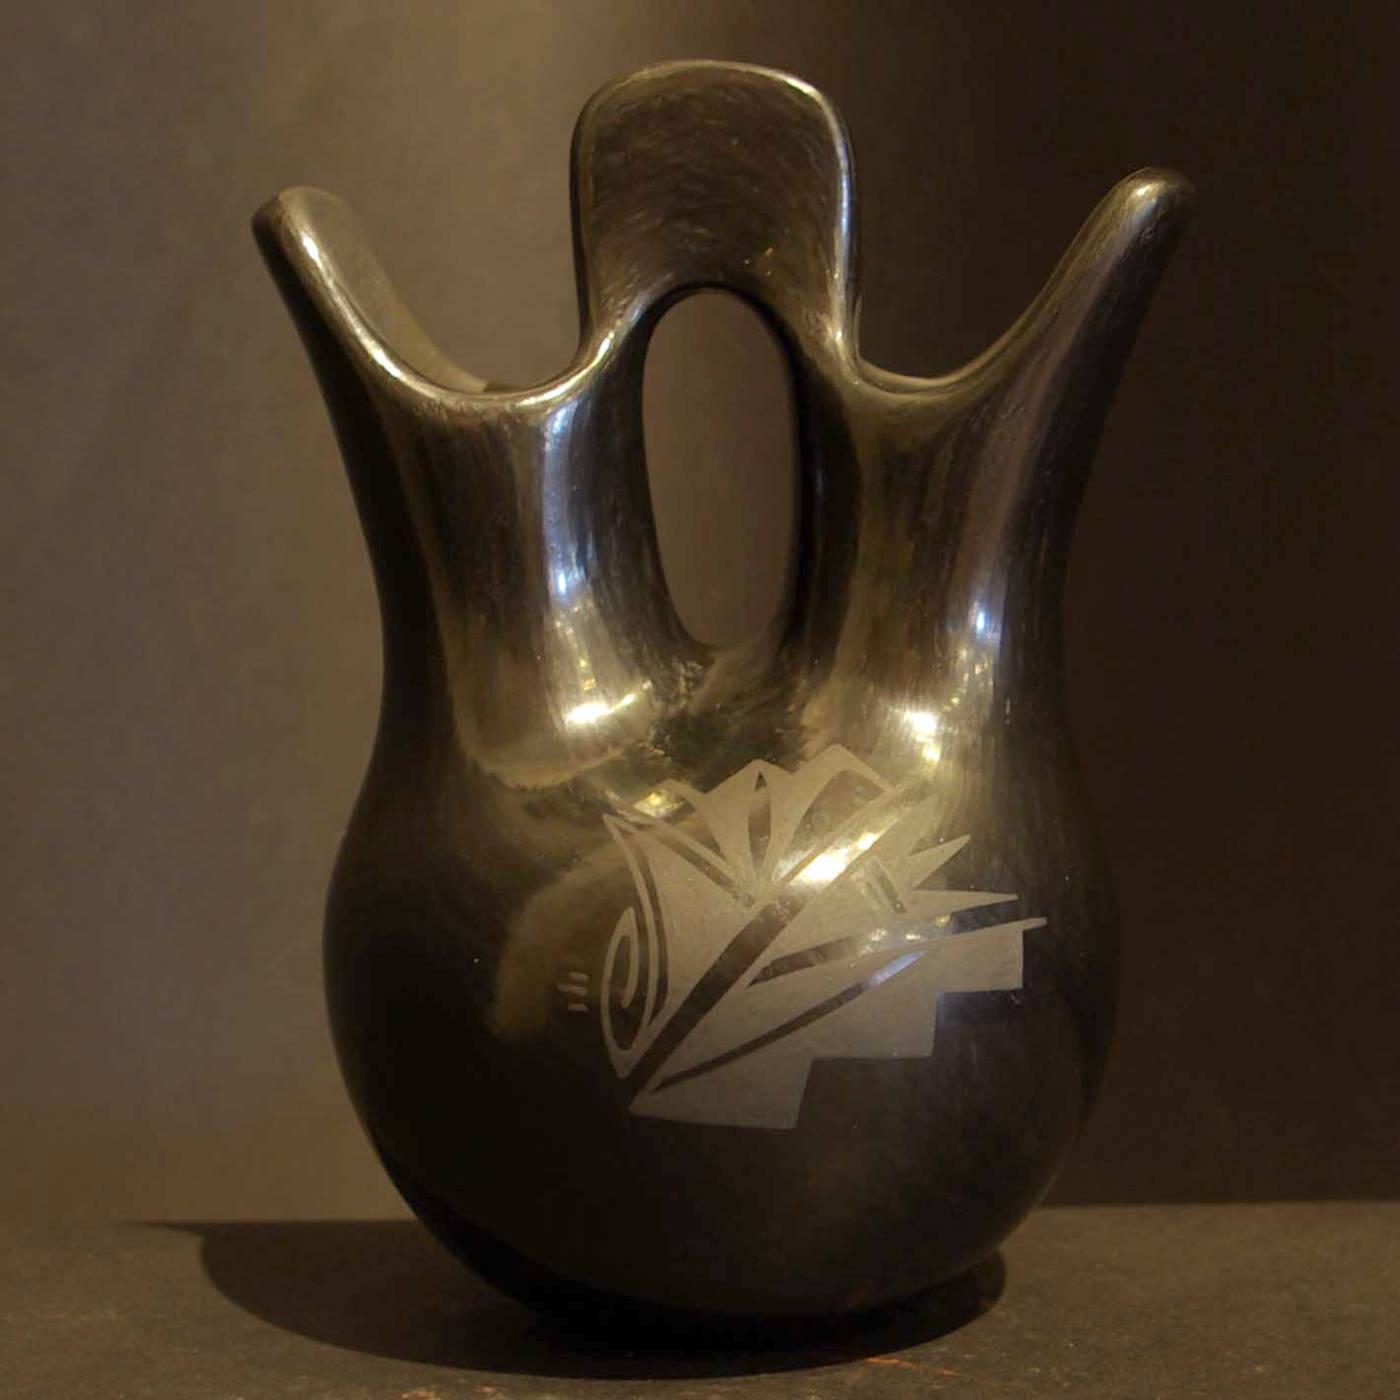 Linda askan wedding vases 1 santa clara pueblo potters geometric design decorates a black on black wedding vase reviewsmspy